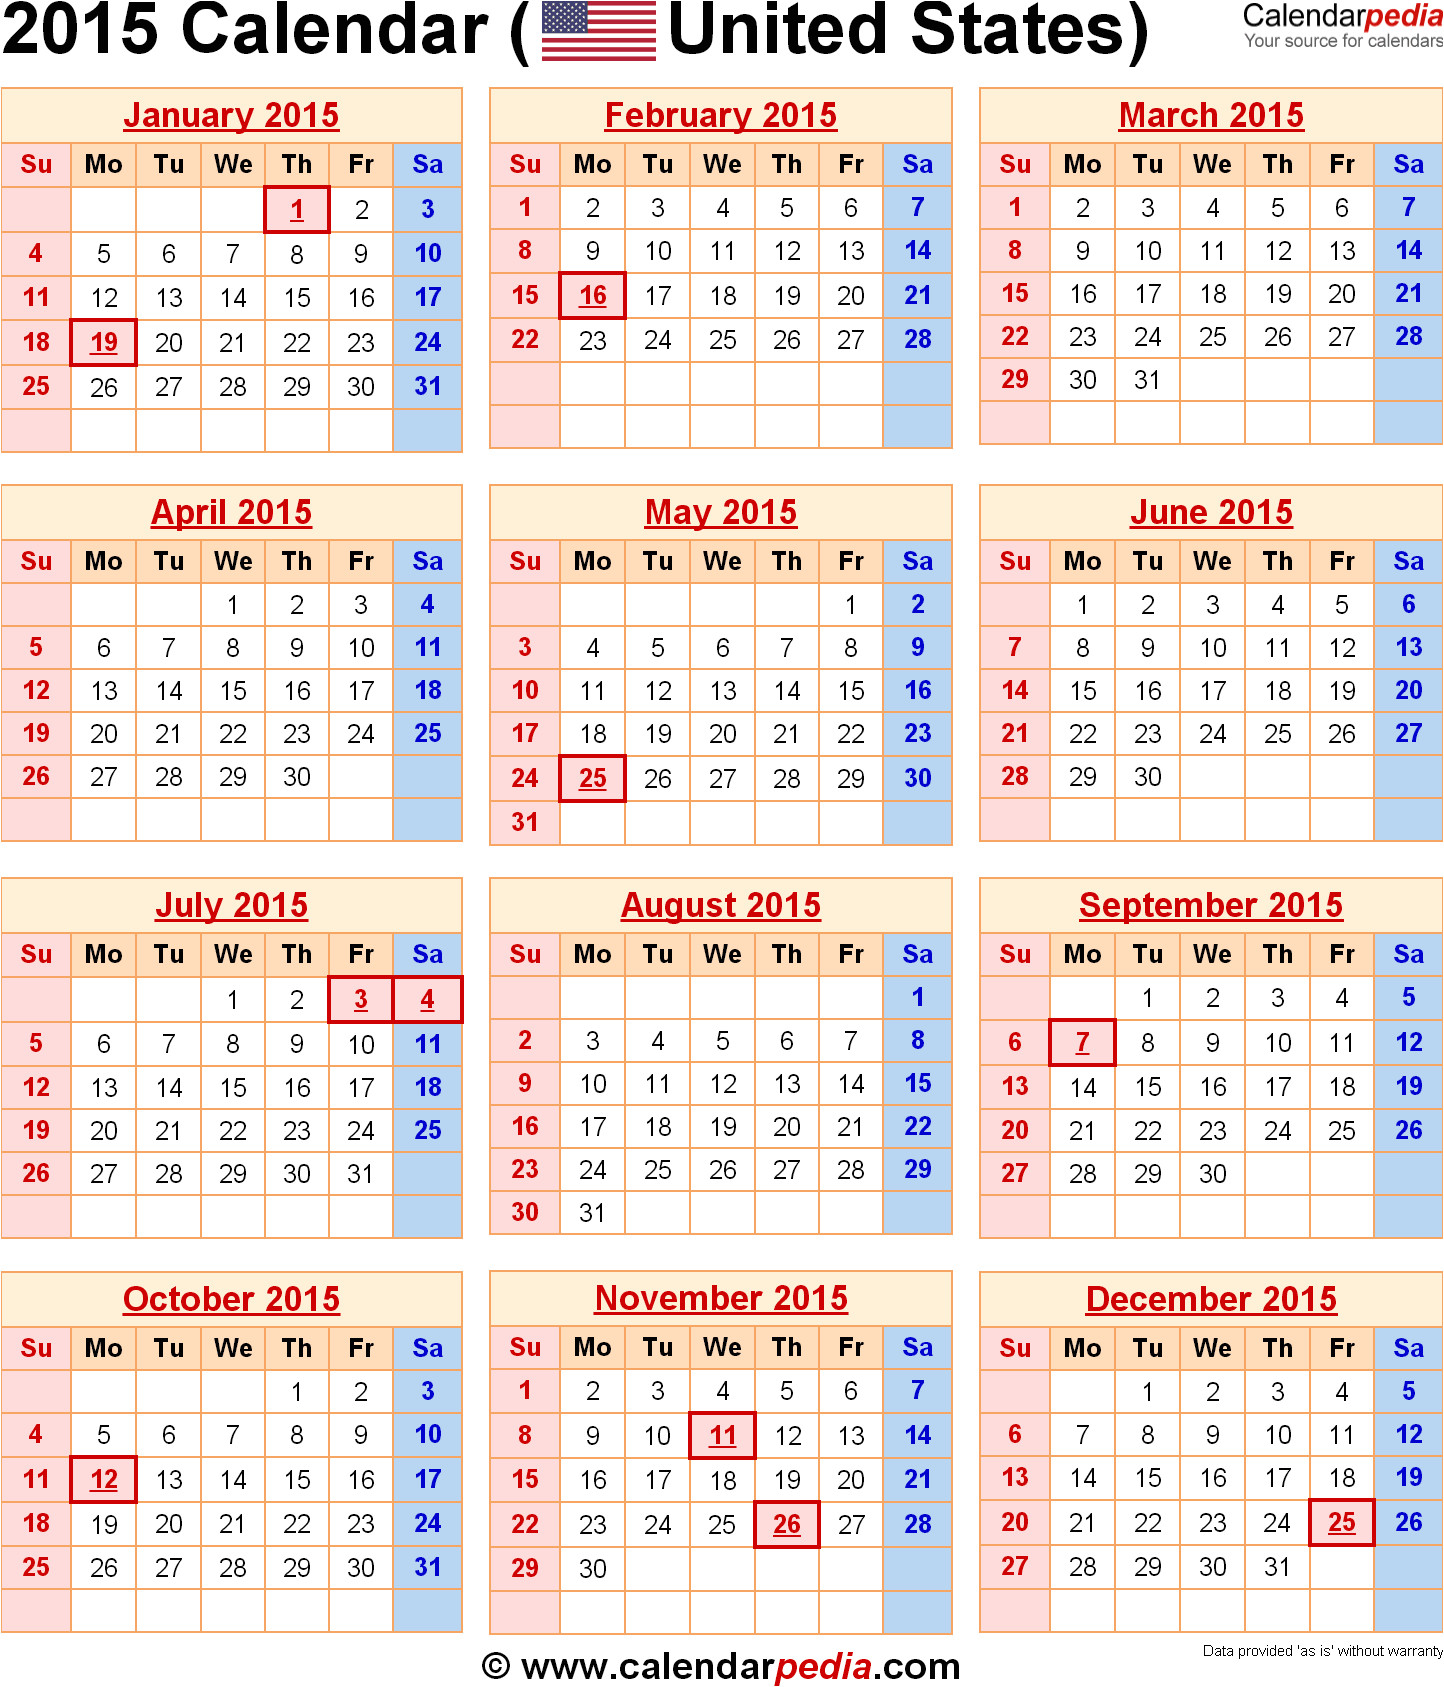 2015 calendar printable with holidays